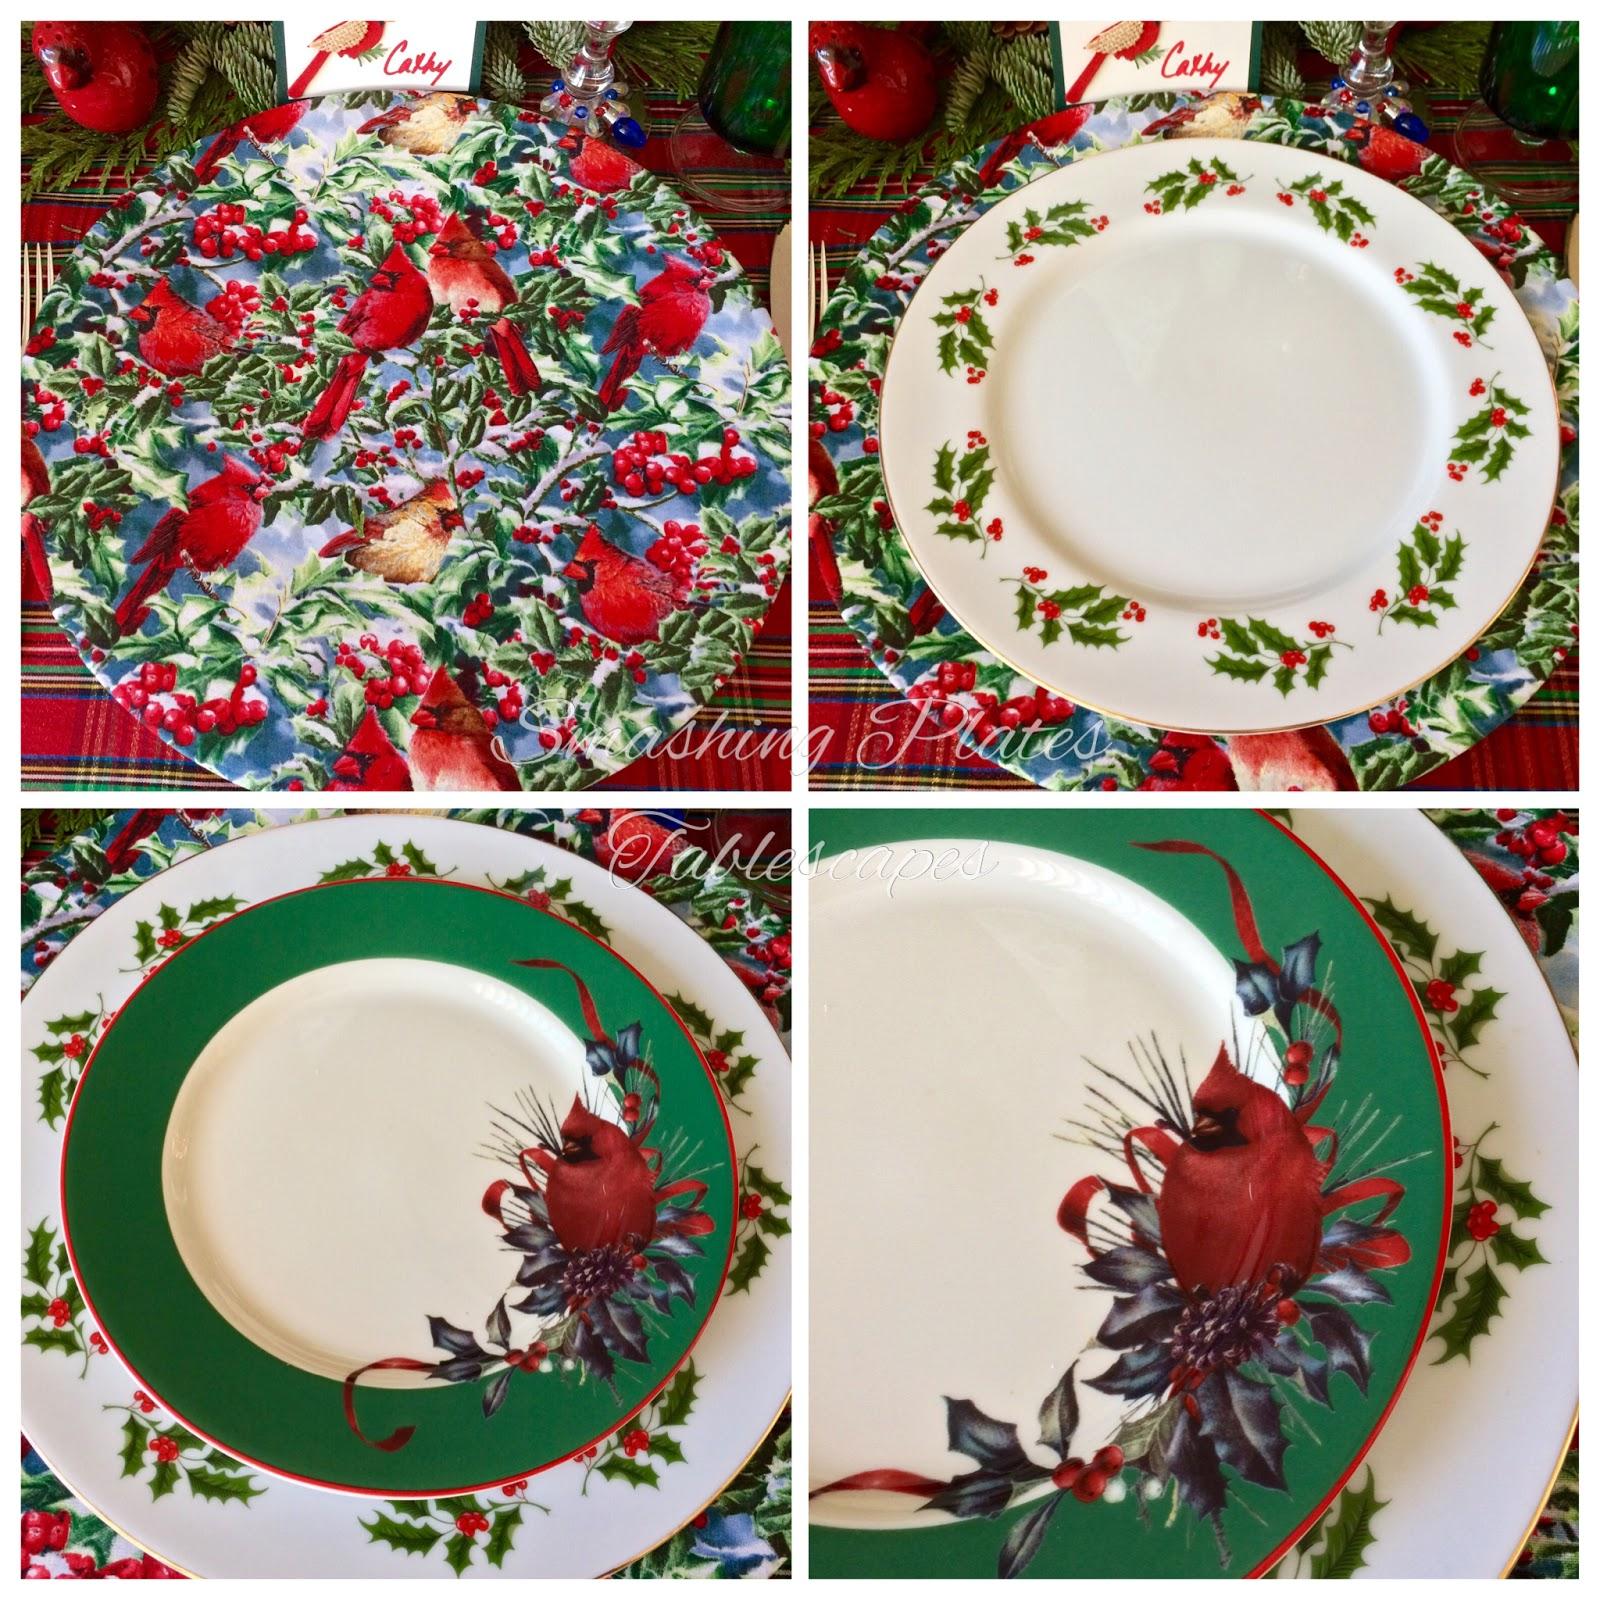 smashing plates tablescapes carolina cardinal christmas